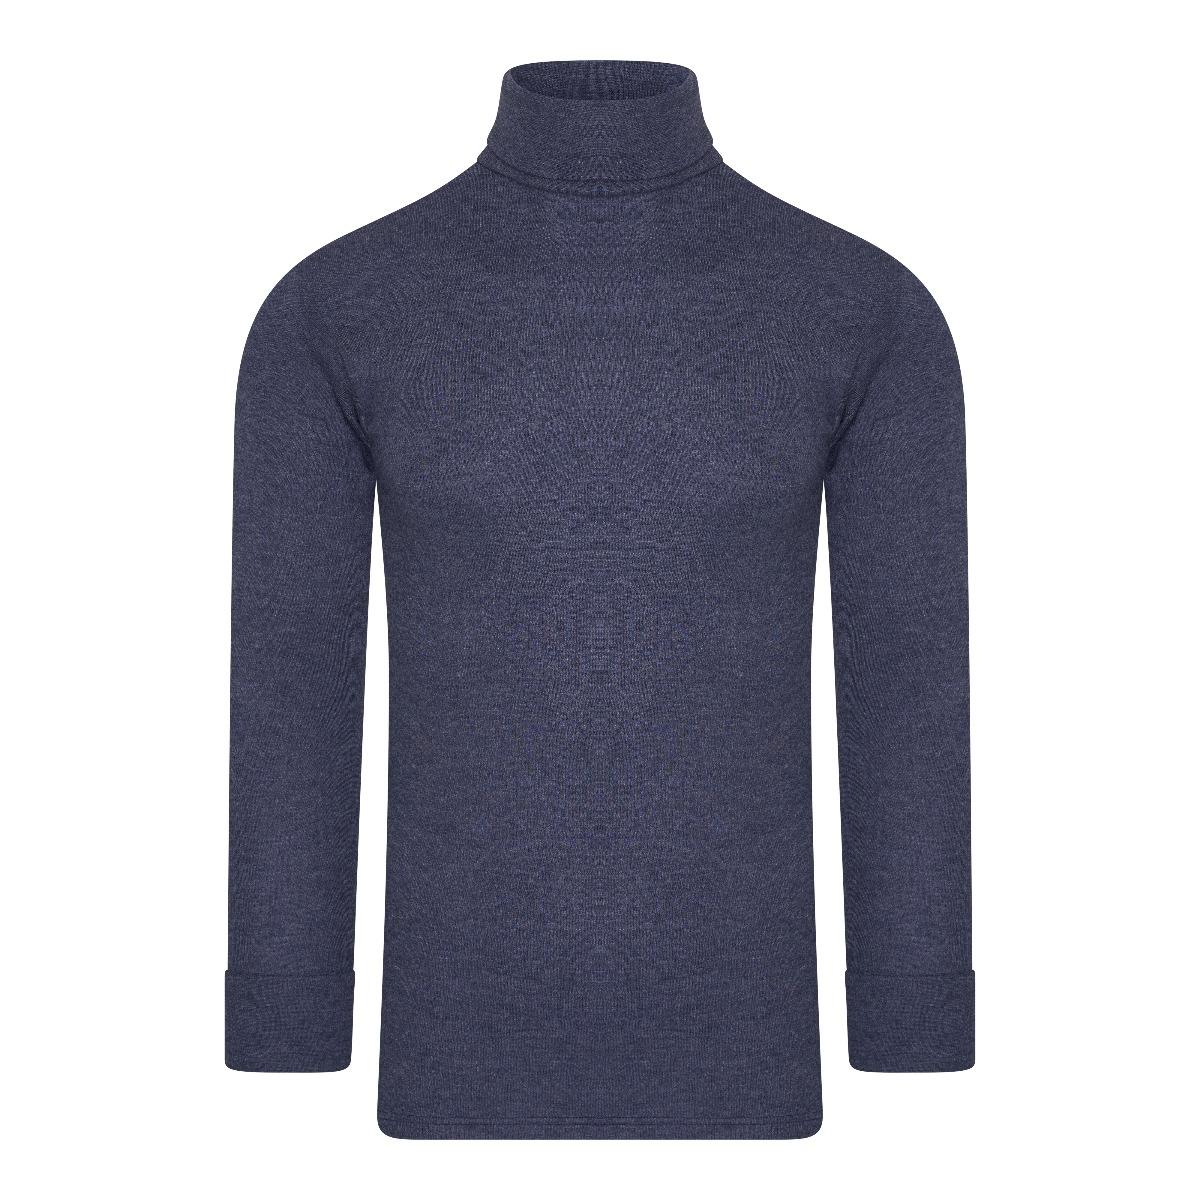 Beeren Thermo Unisex Shirt Col Lange Mouw Marine M